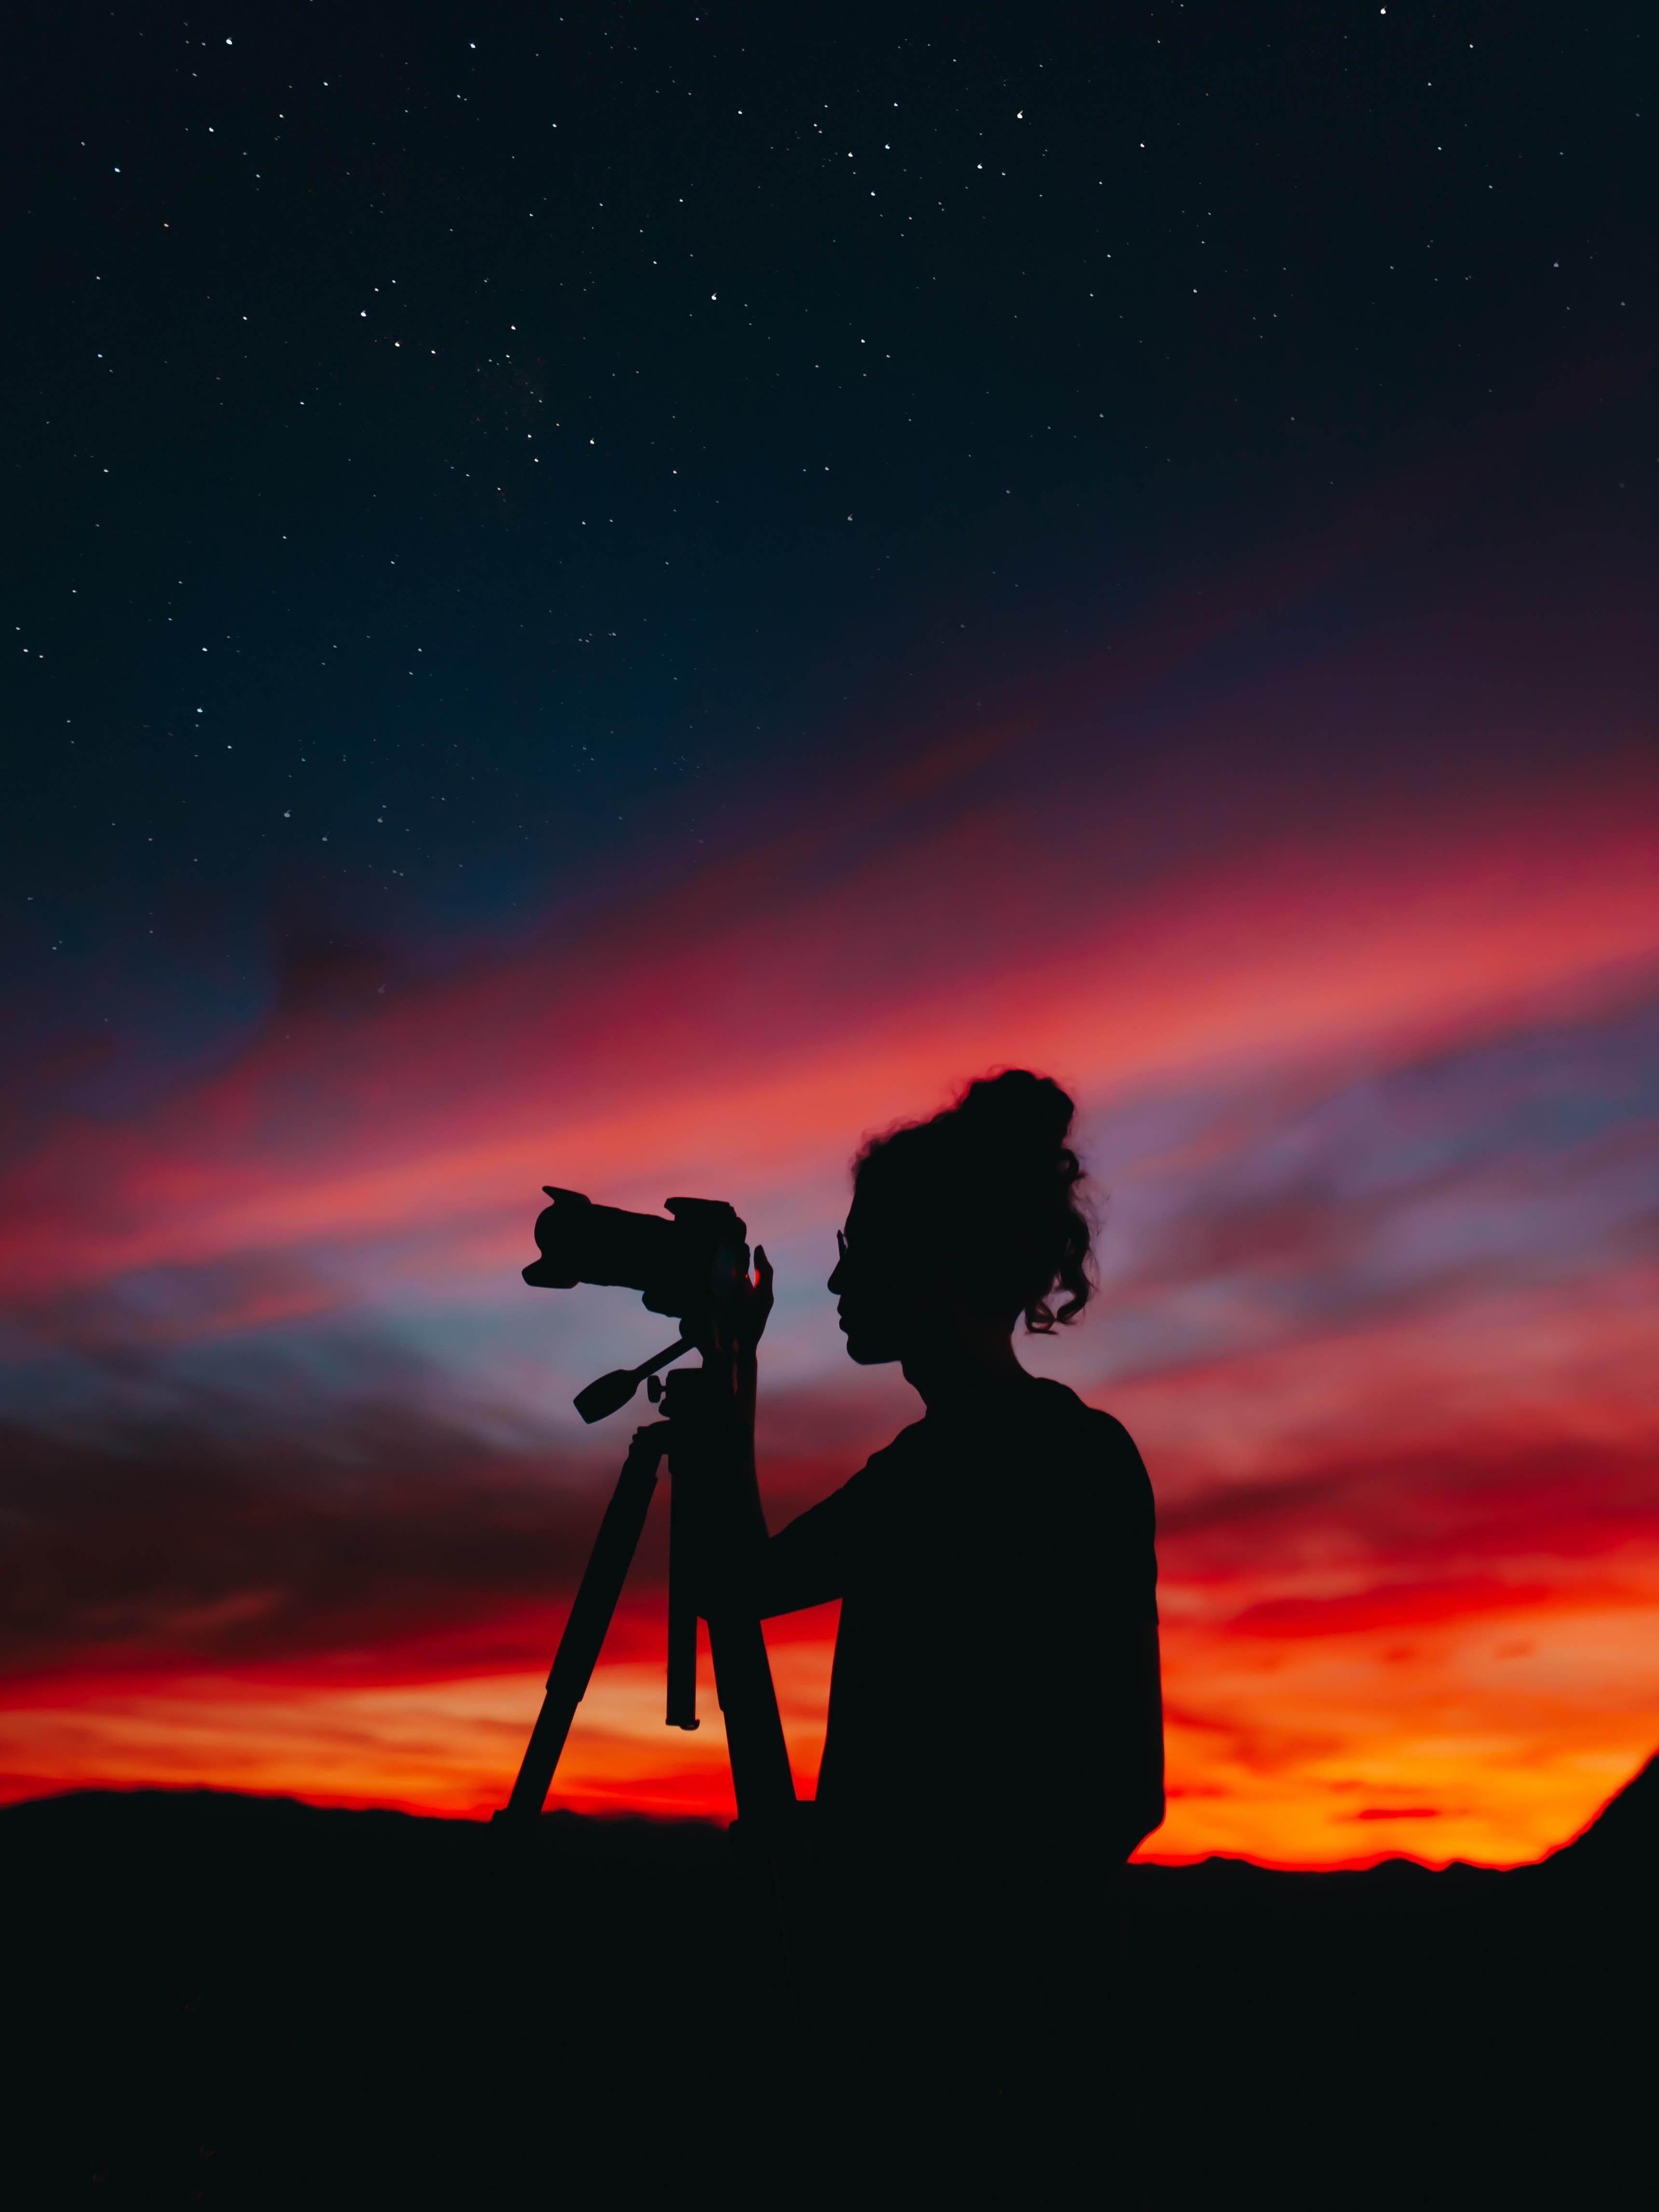 honeybee videographer tripod camera video editing athens greece career